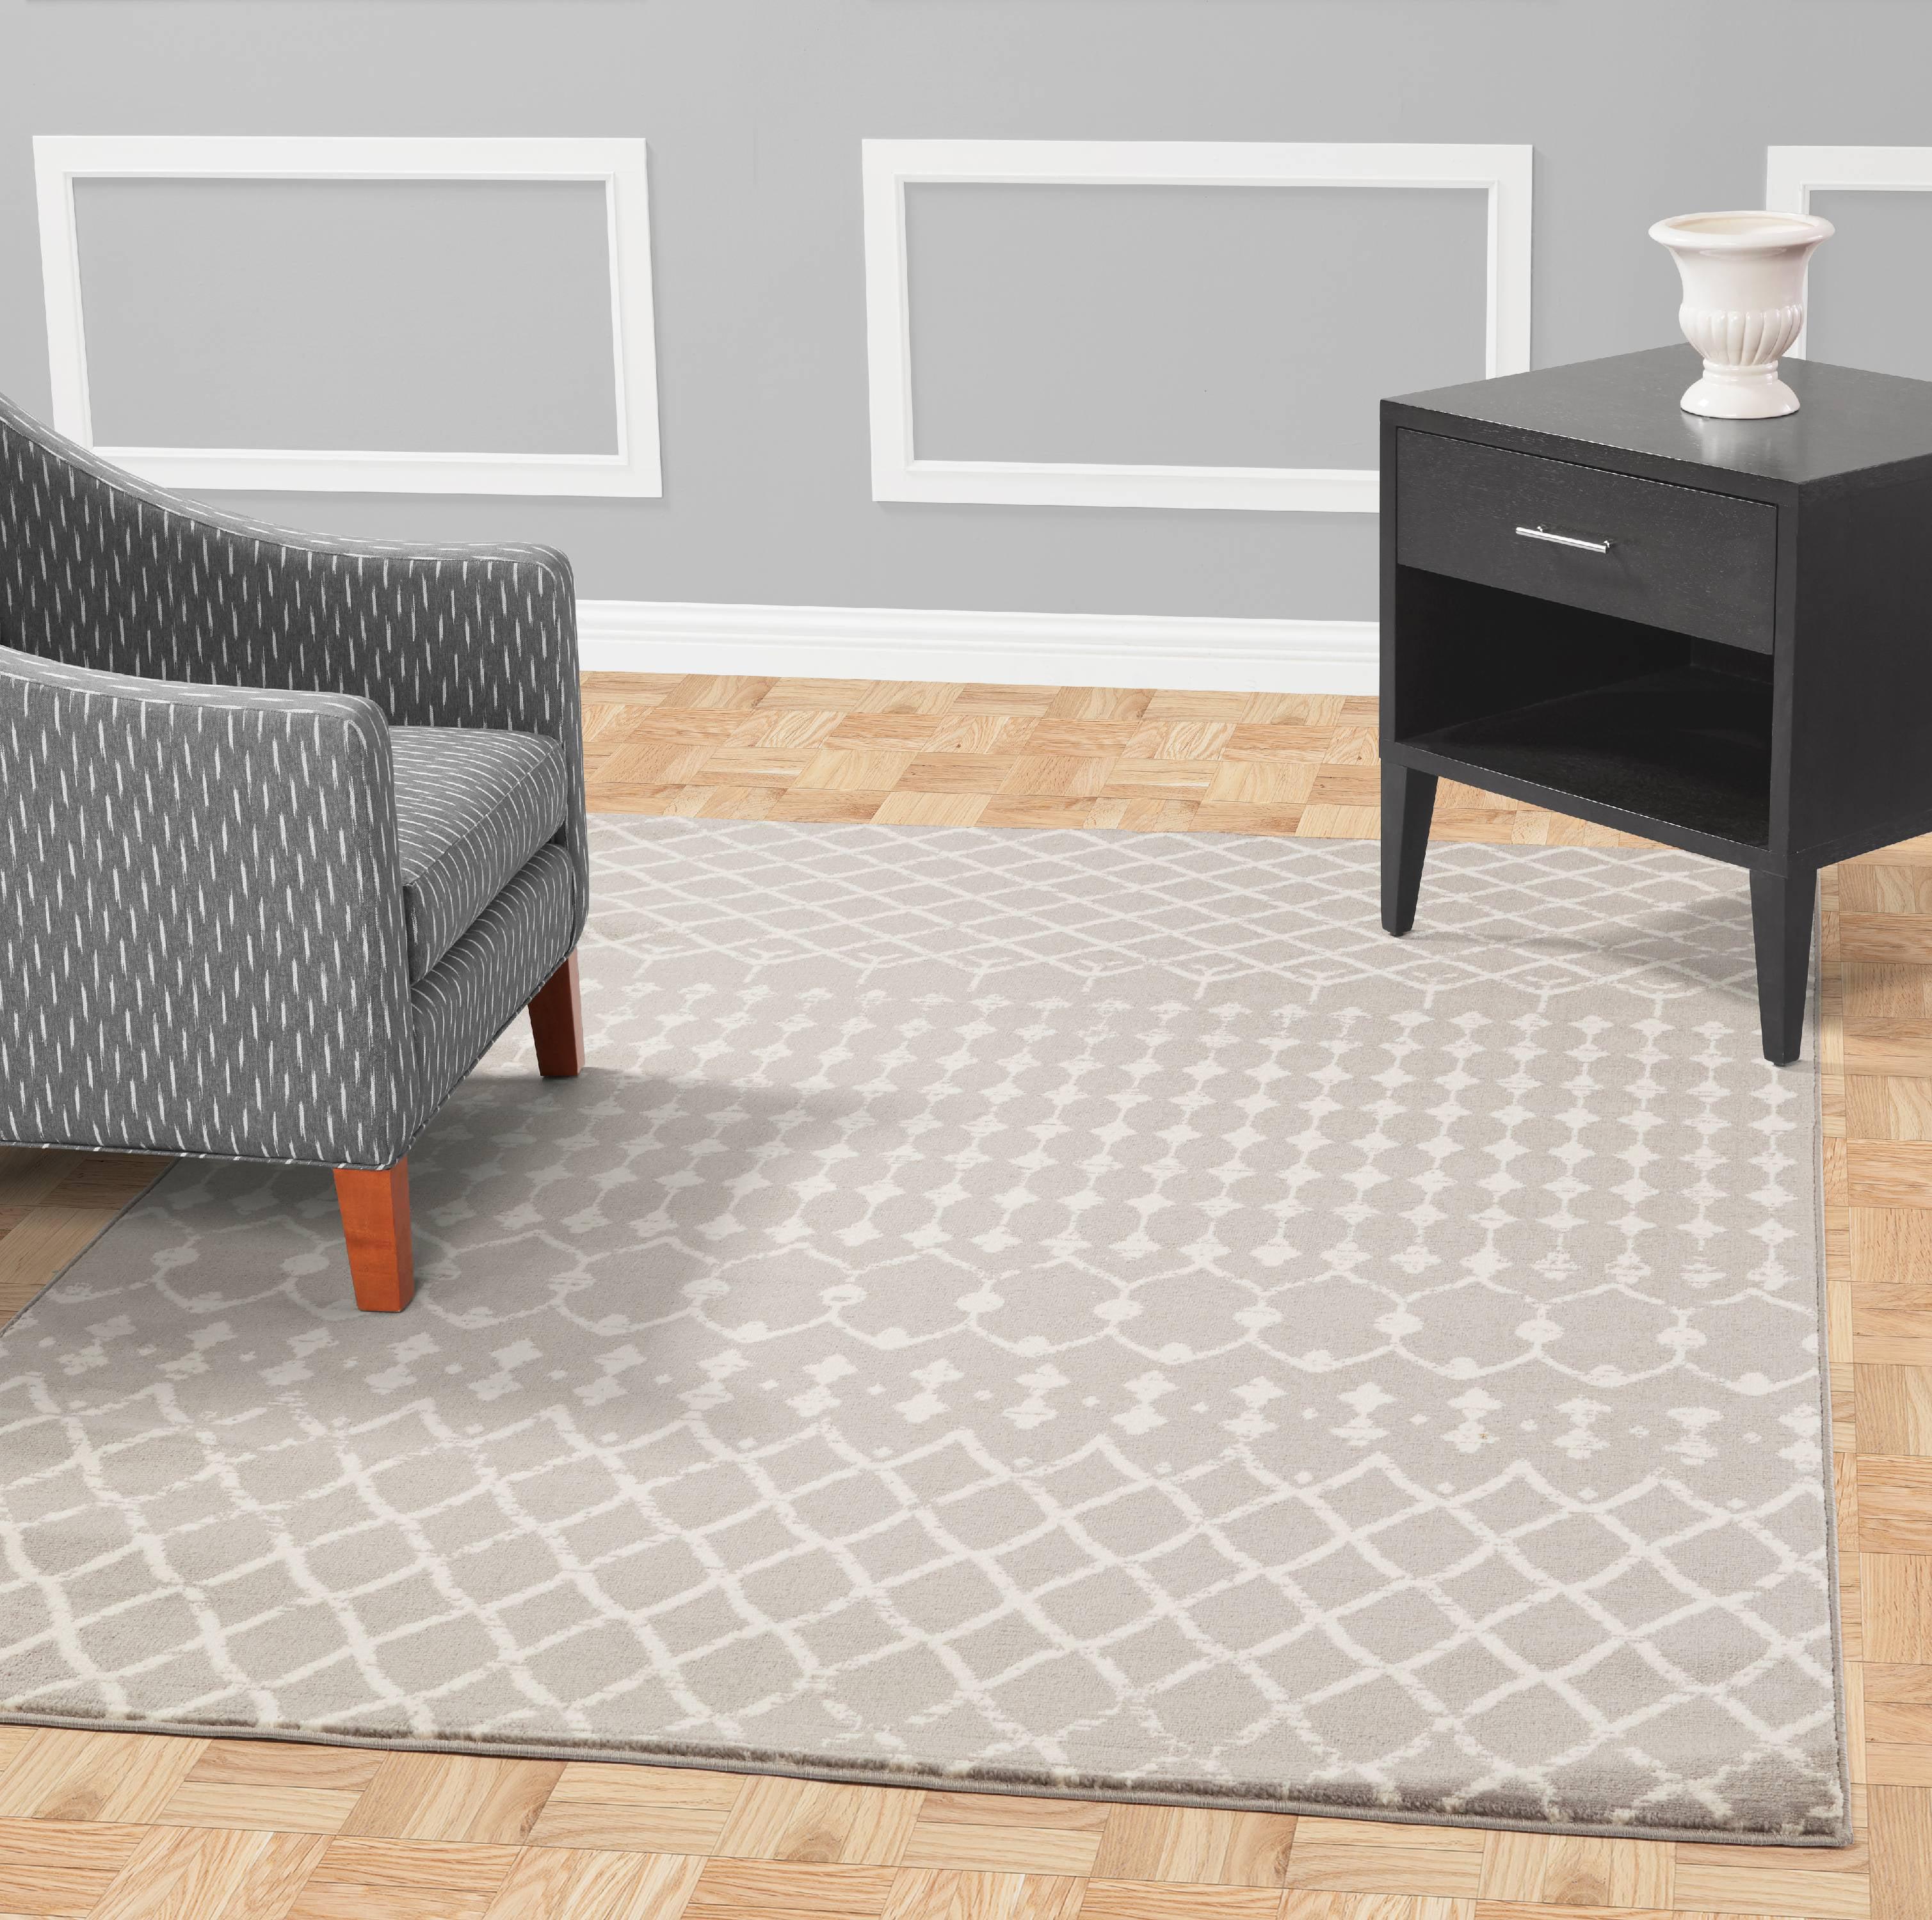 Diagona Designs Contemporary Geometric Moroccan Trellis